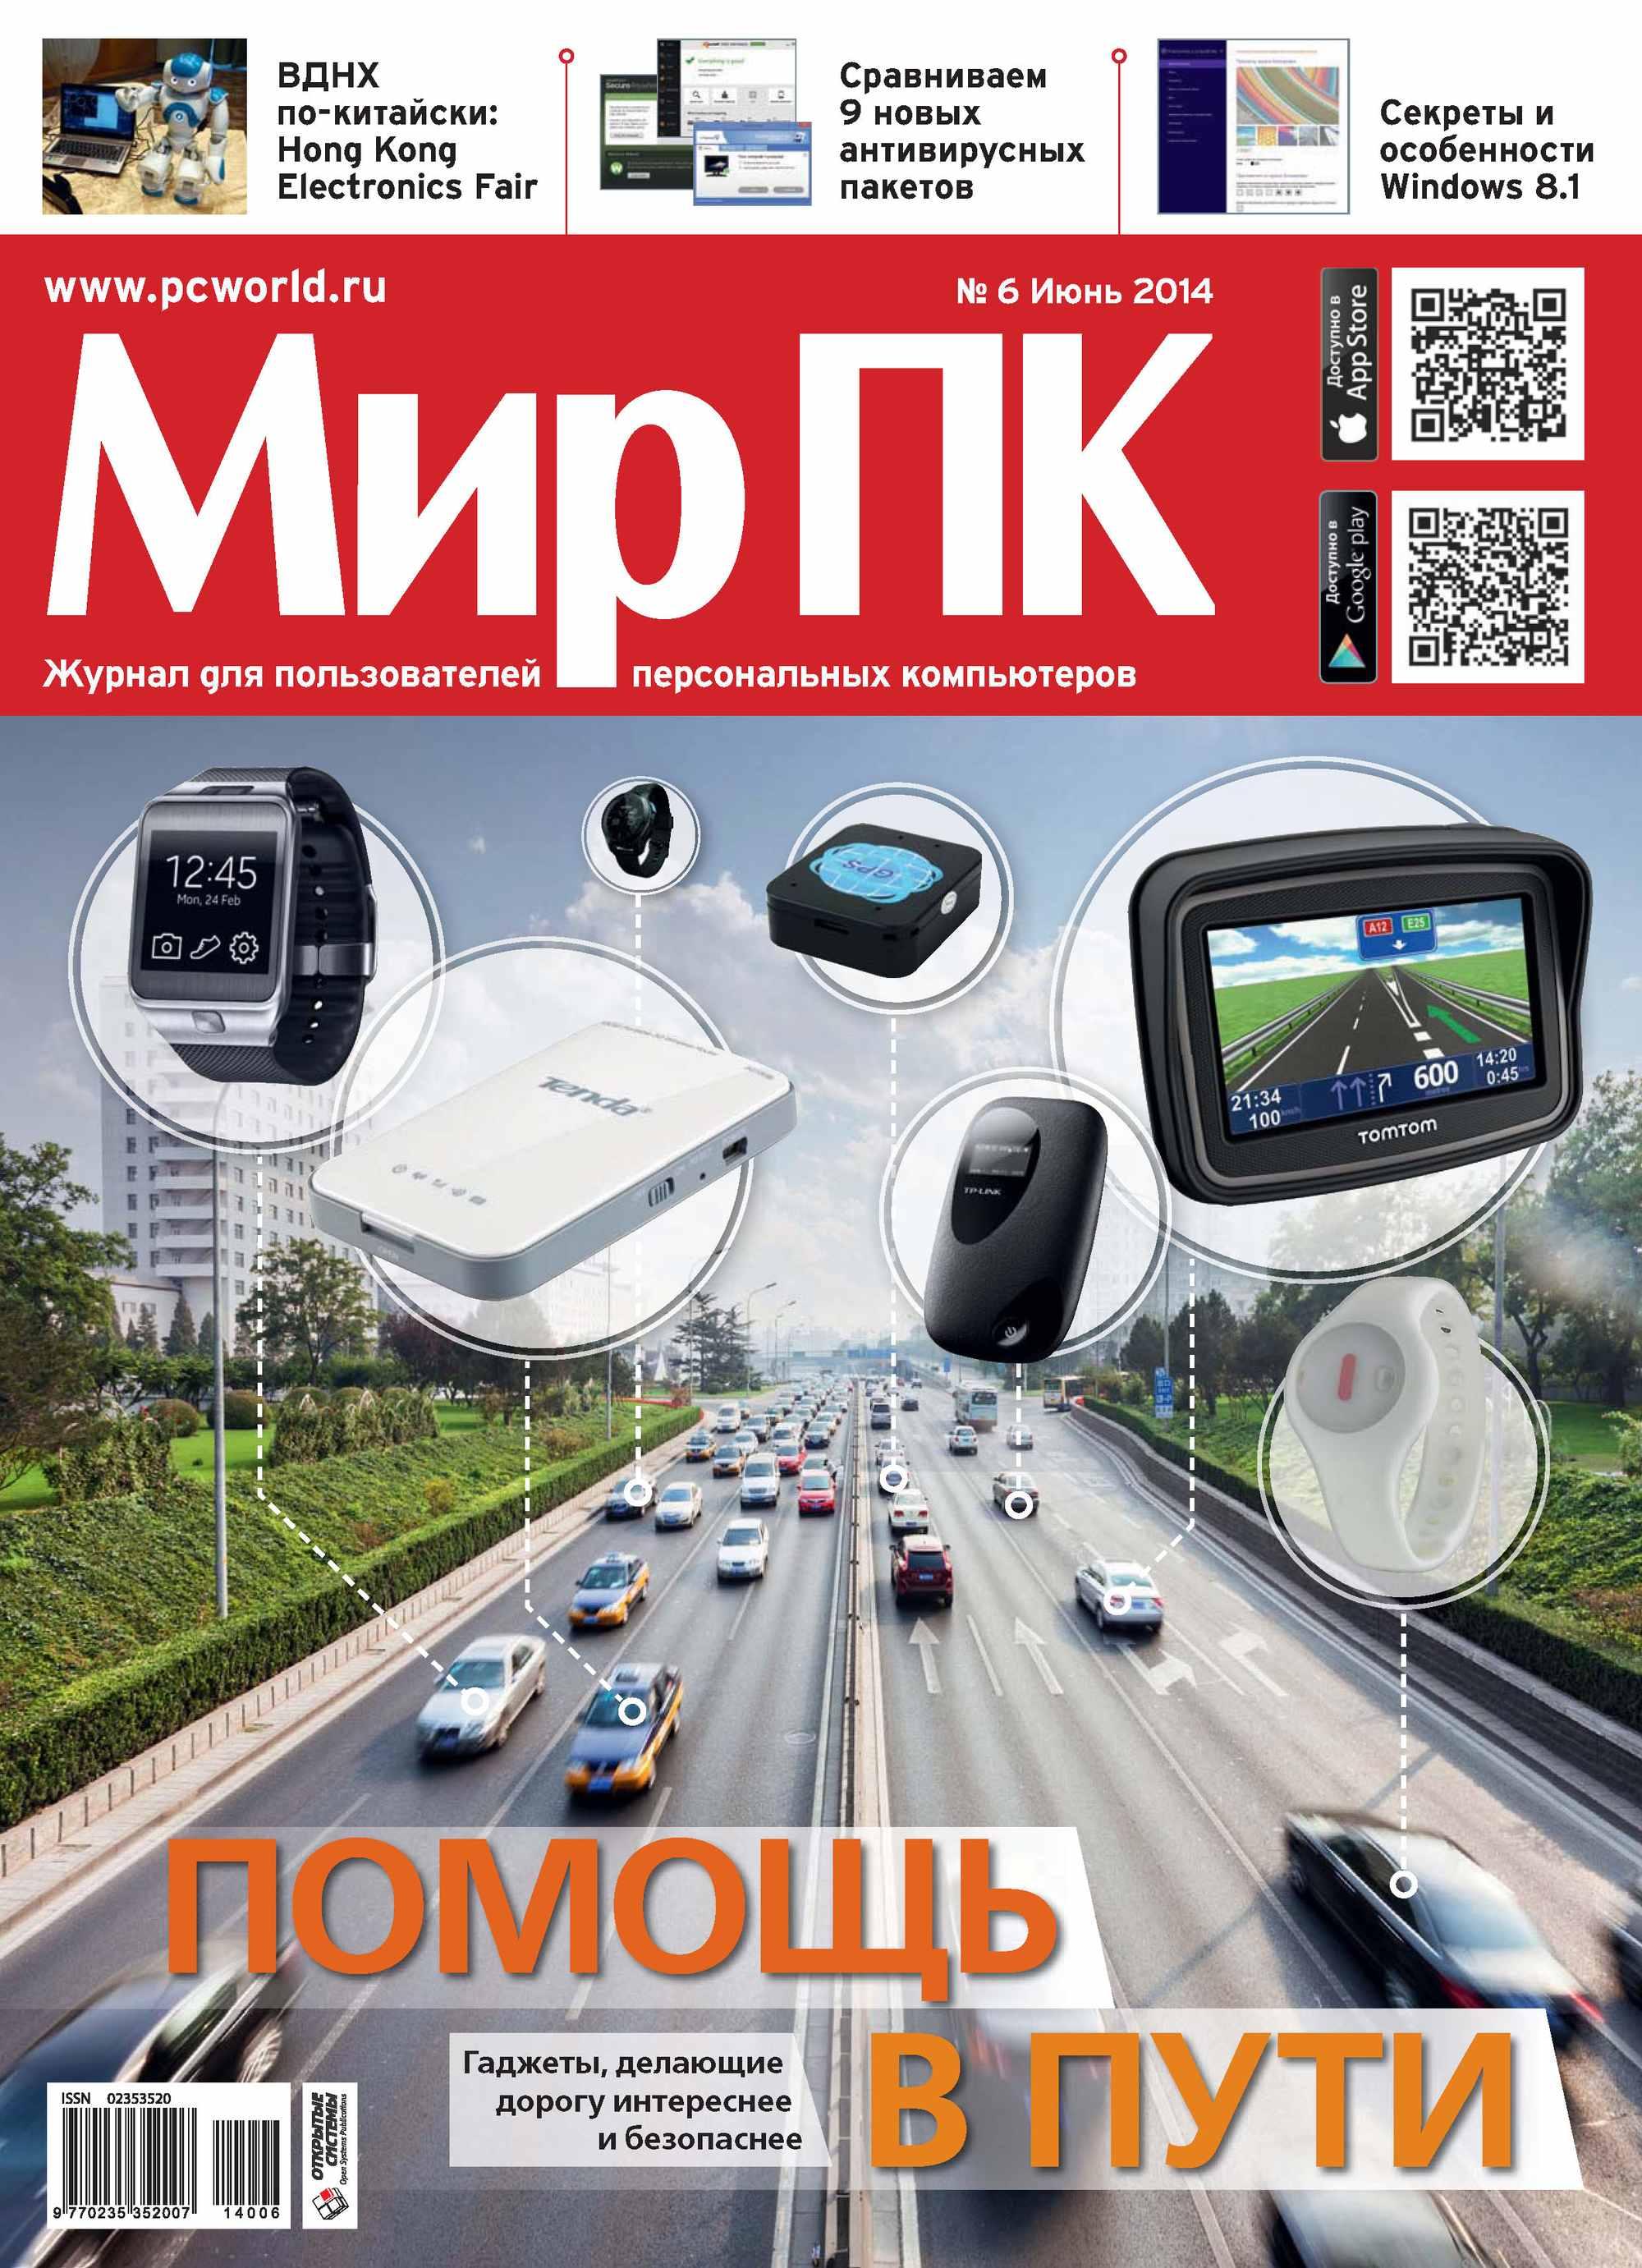 Мир ПК Журнал «Мир ПК» №06/2014 лисистрата